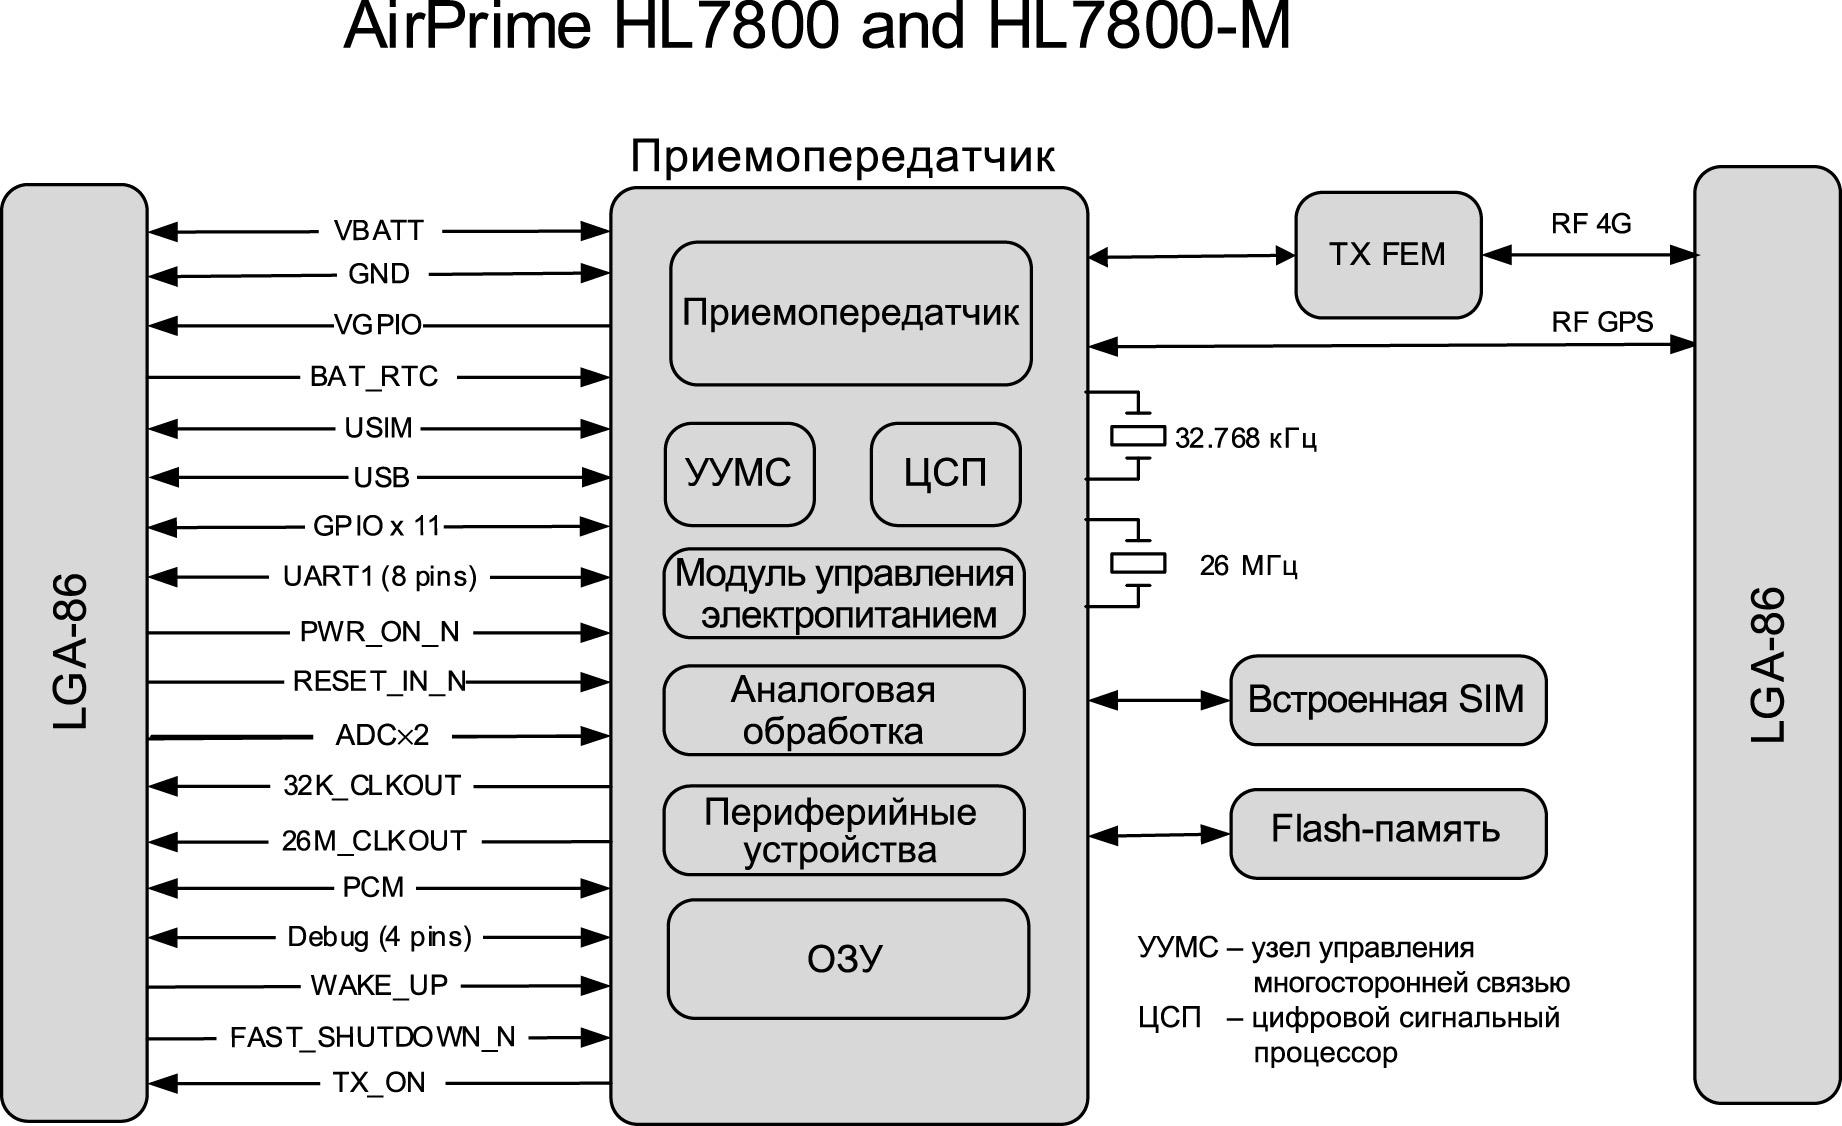 Структура модуля HL7800